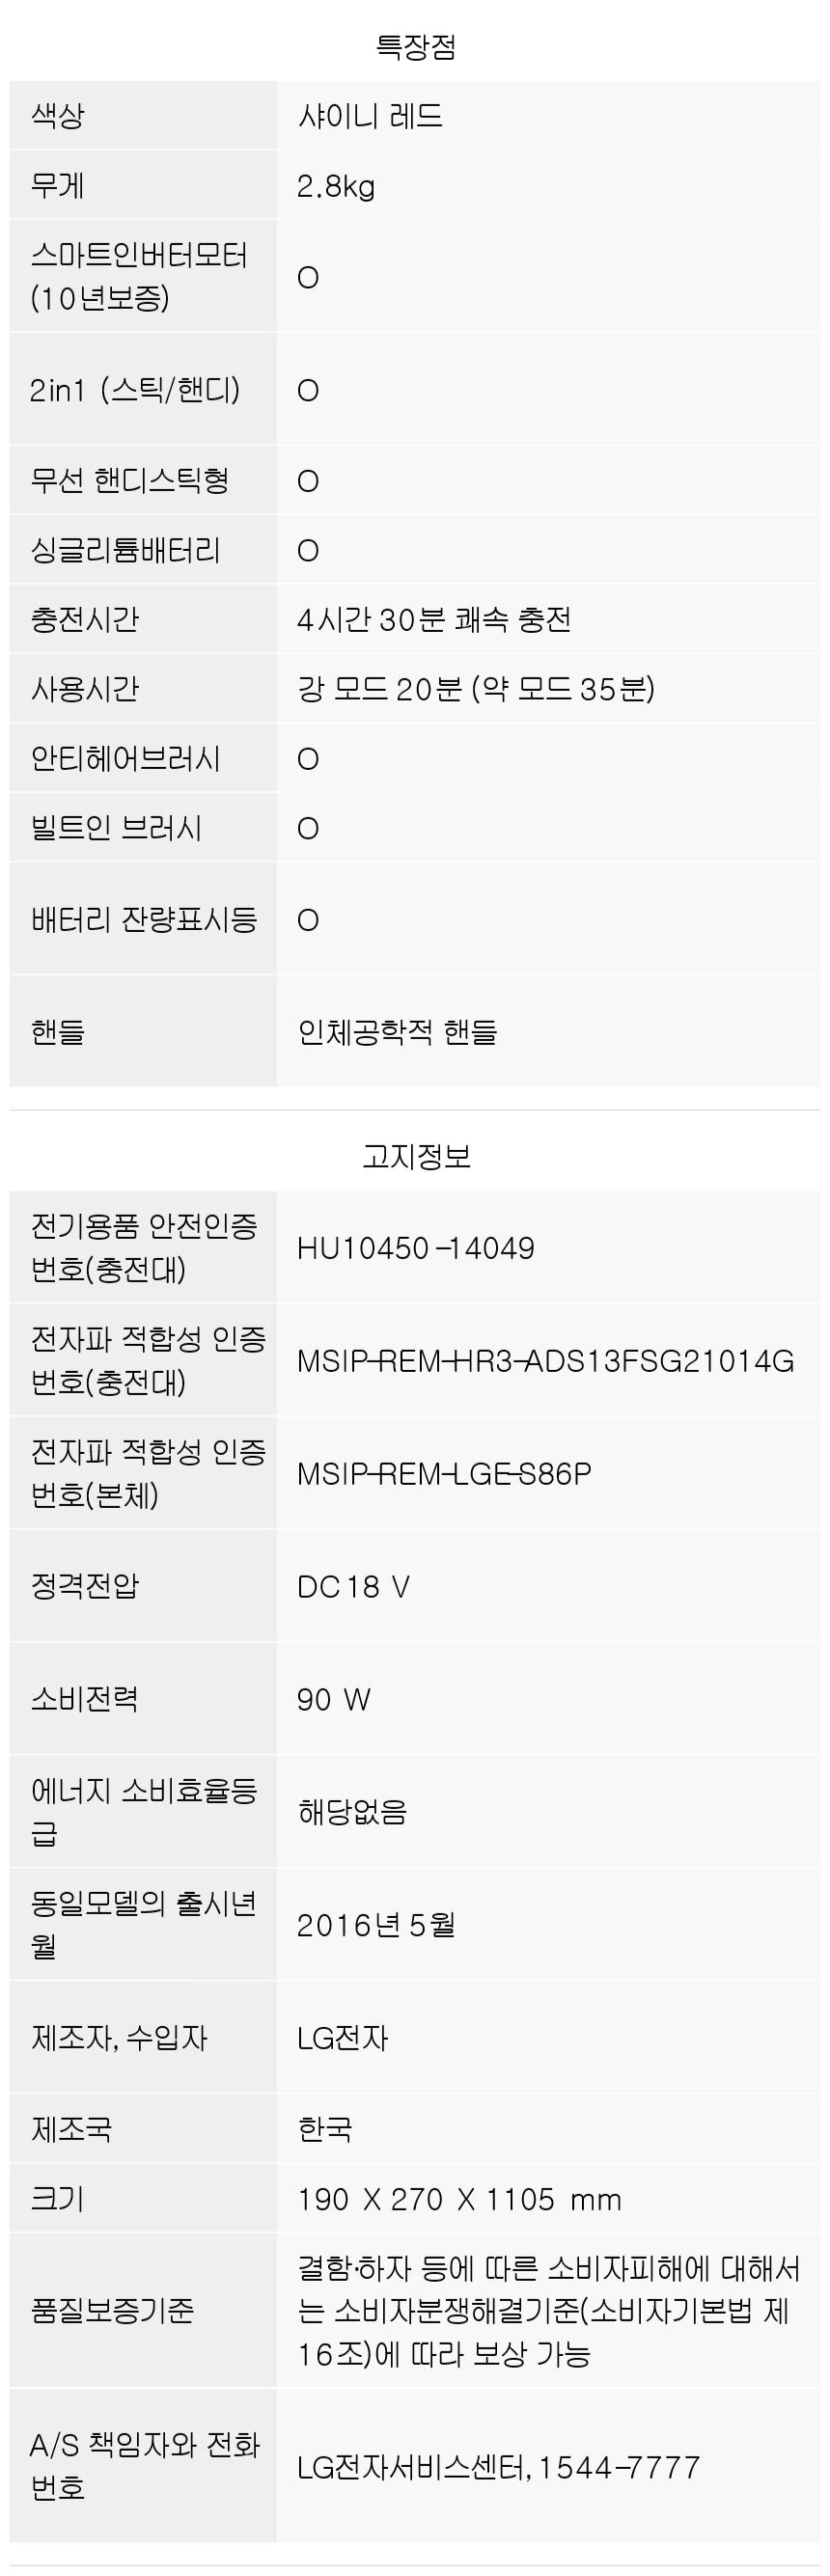 S86R 제품 사양